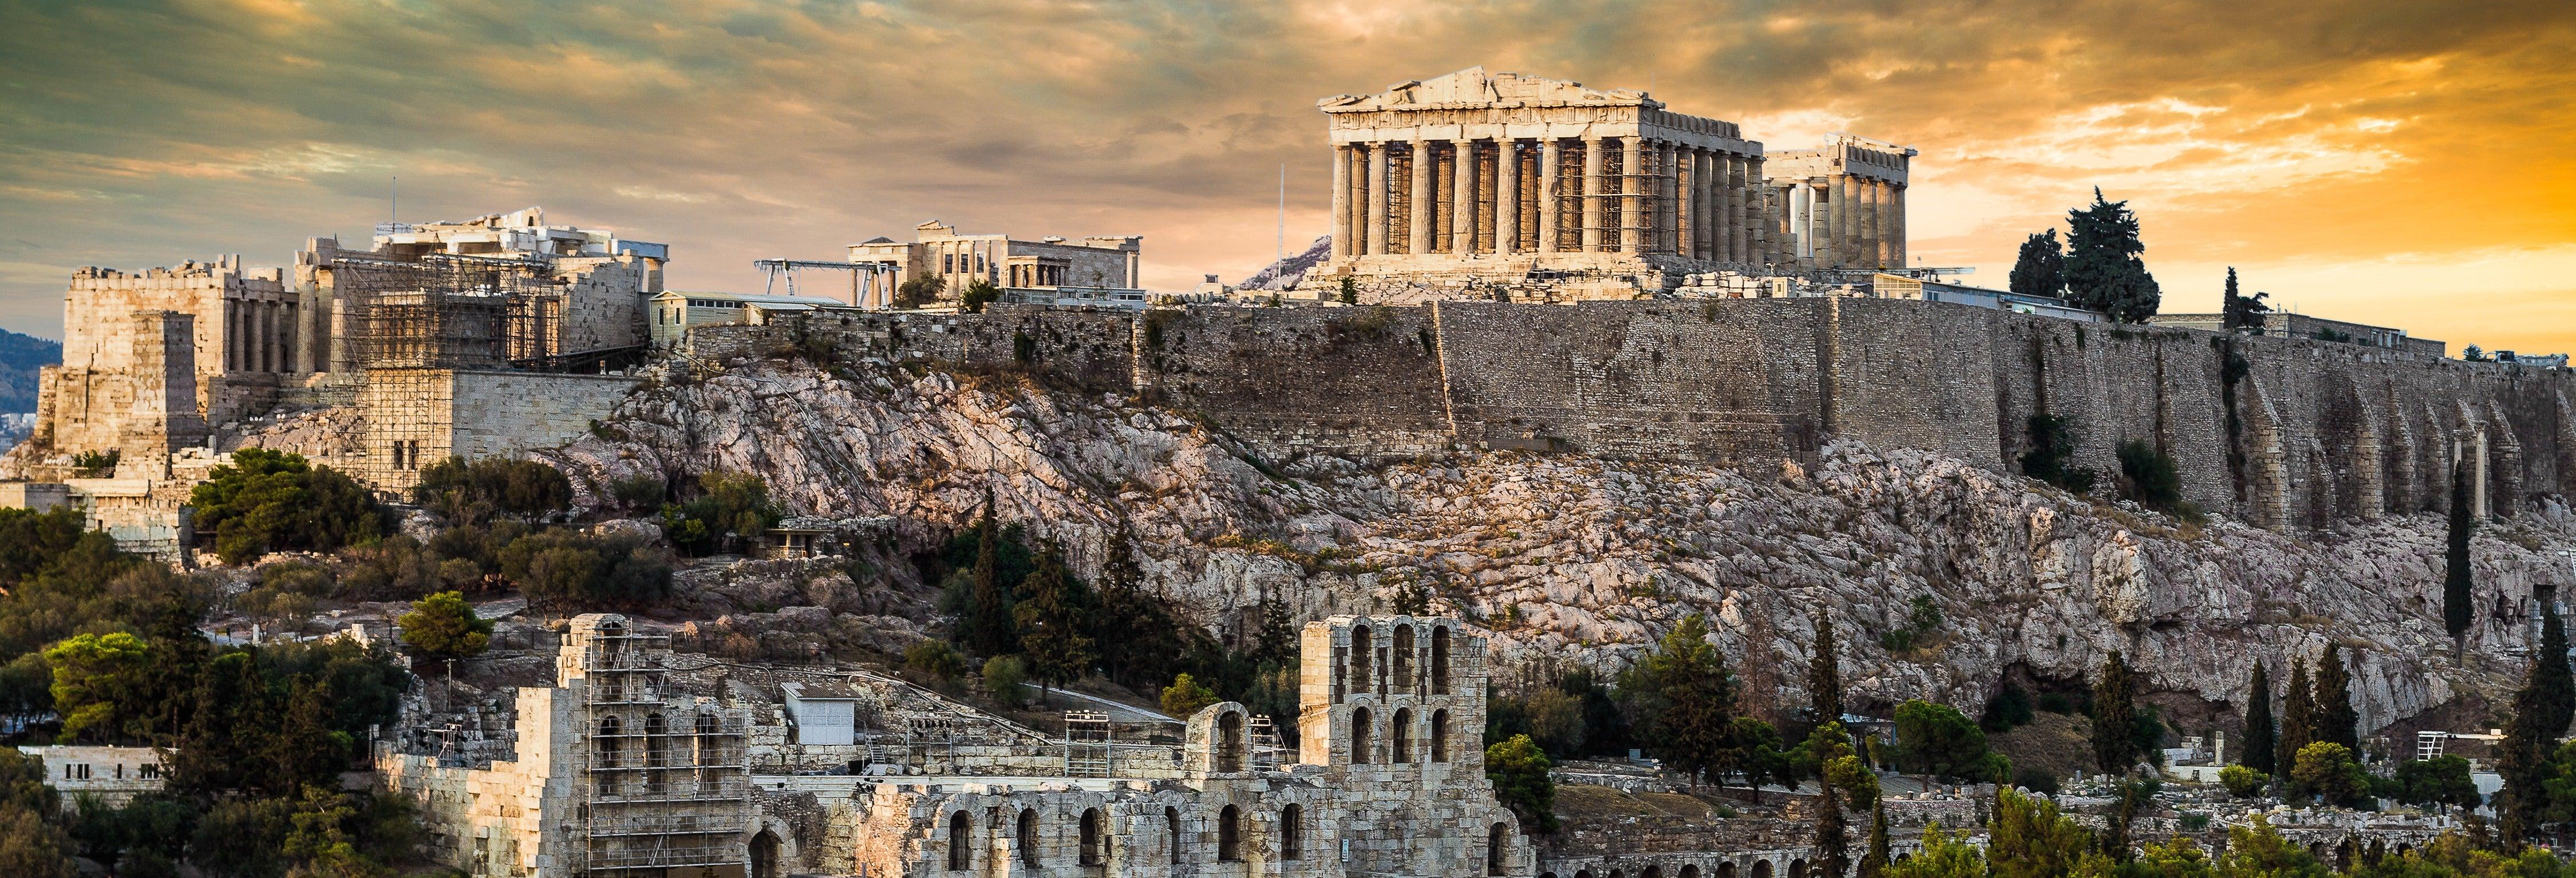 Tour privado por Atenas con guía en español